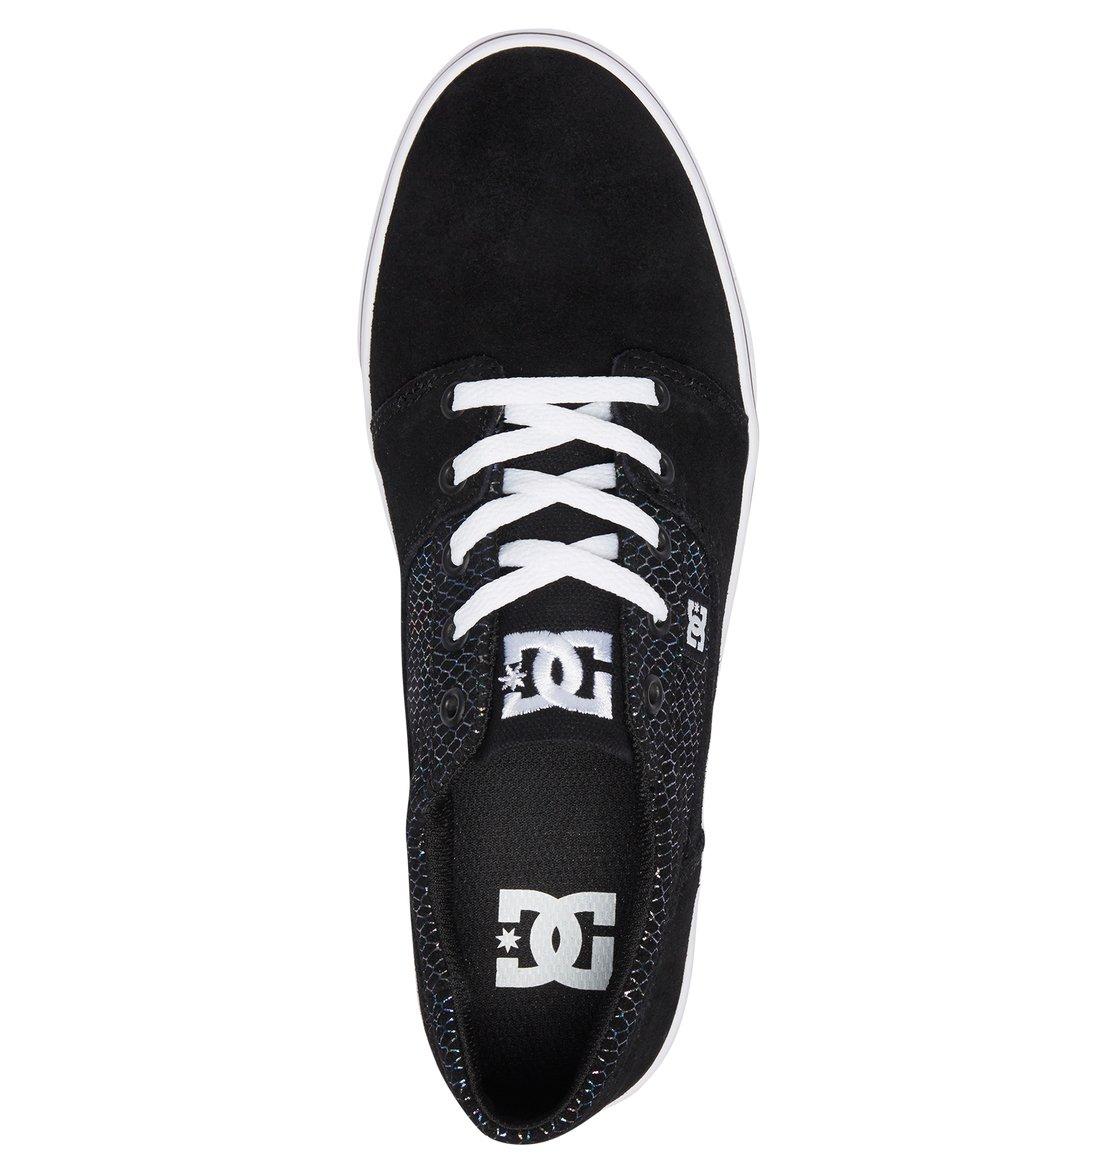 Details zu DC Shoes Damen Schuhe Chelsea Sneaker pfirsich Frauen Schuh orange pink Women